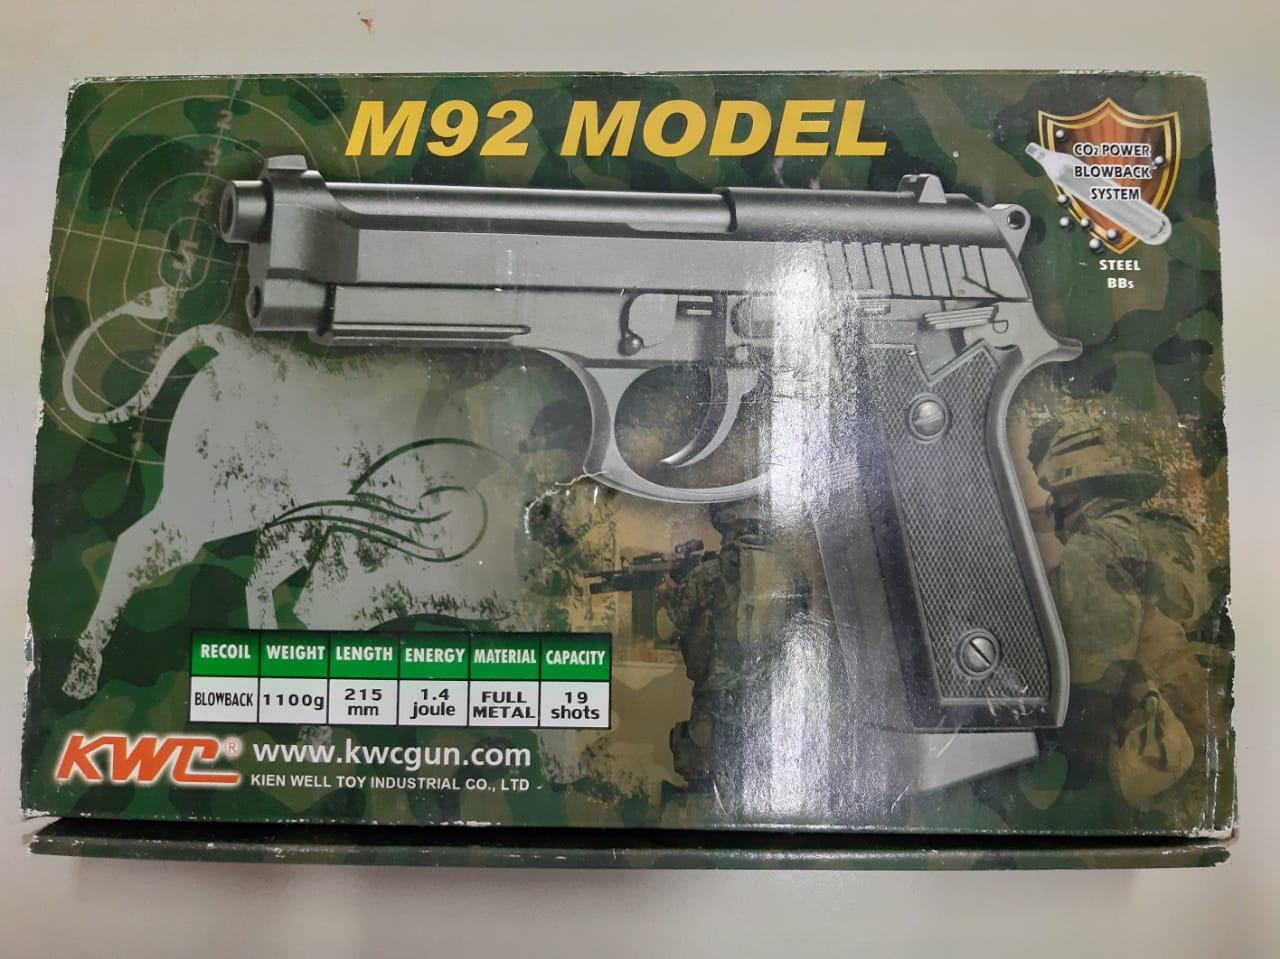 KWC Full Metal blowback co2 gas toygun